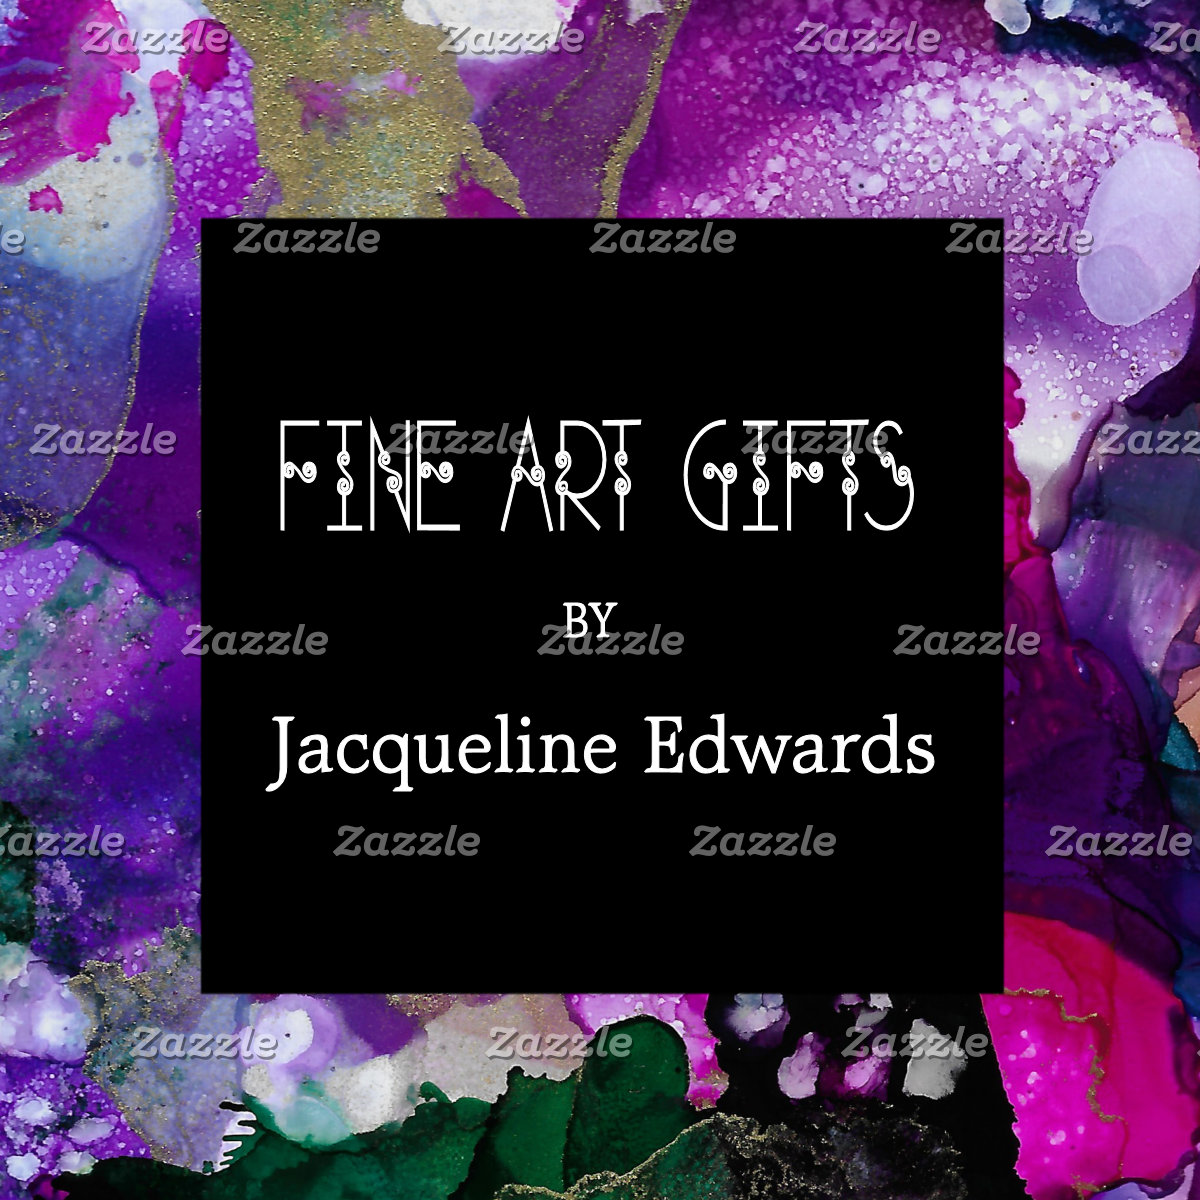 6. FINE ART by Jacqueline Edwards